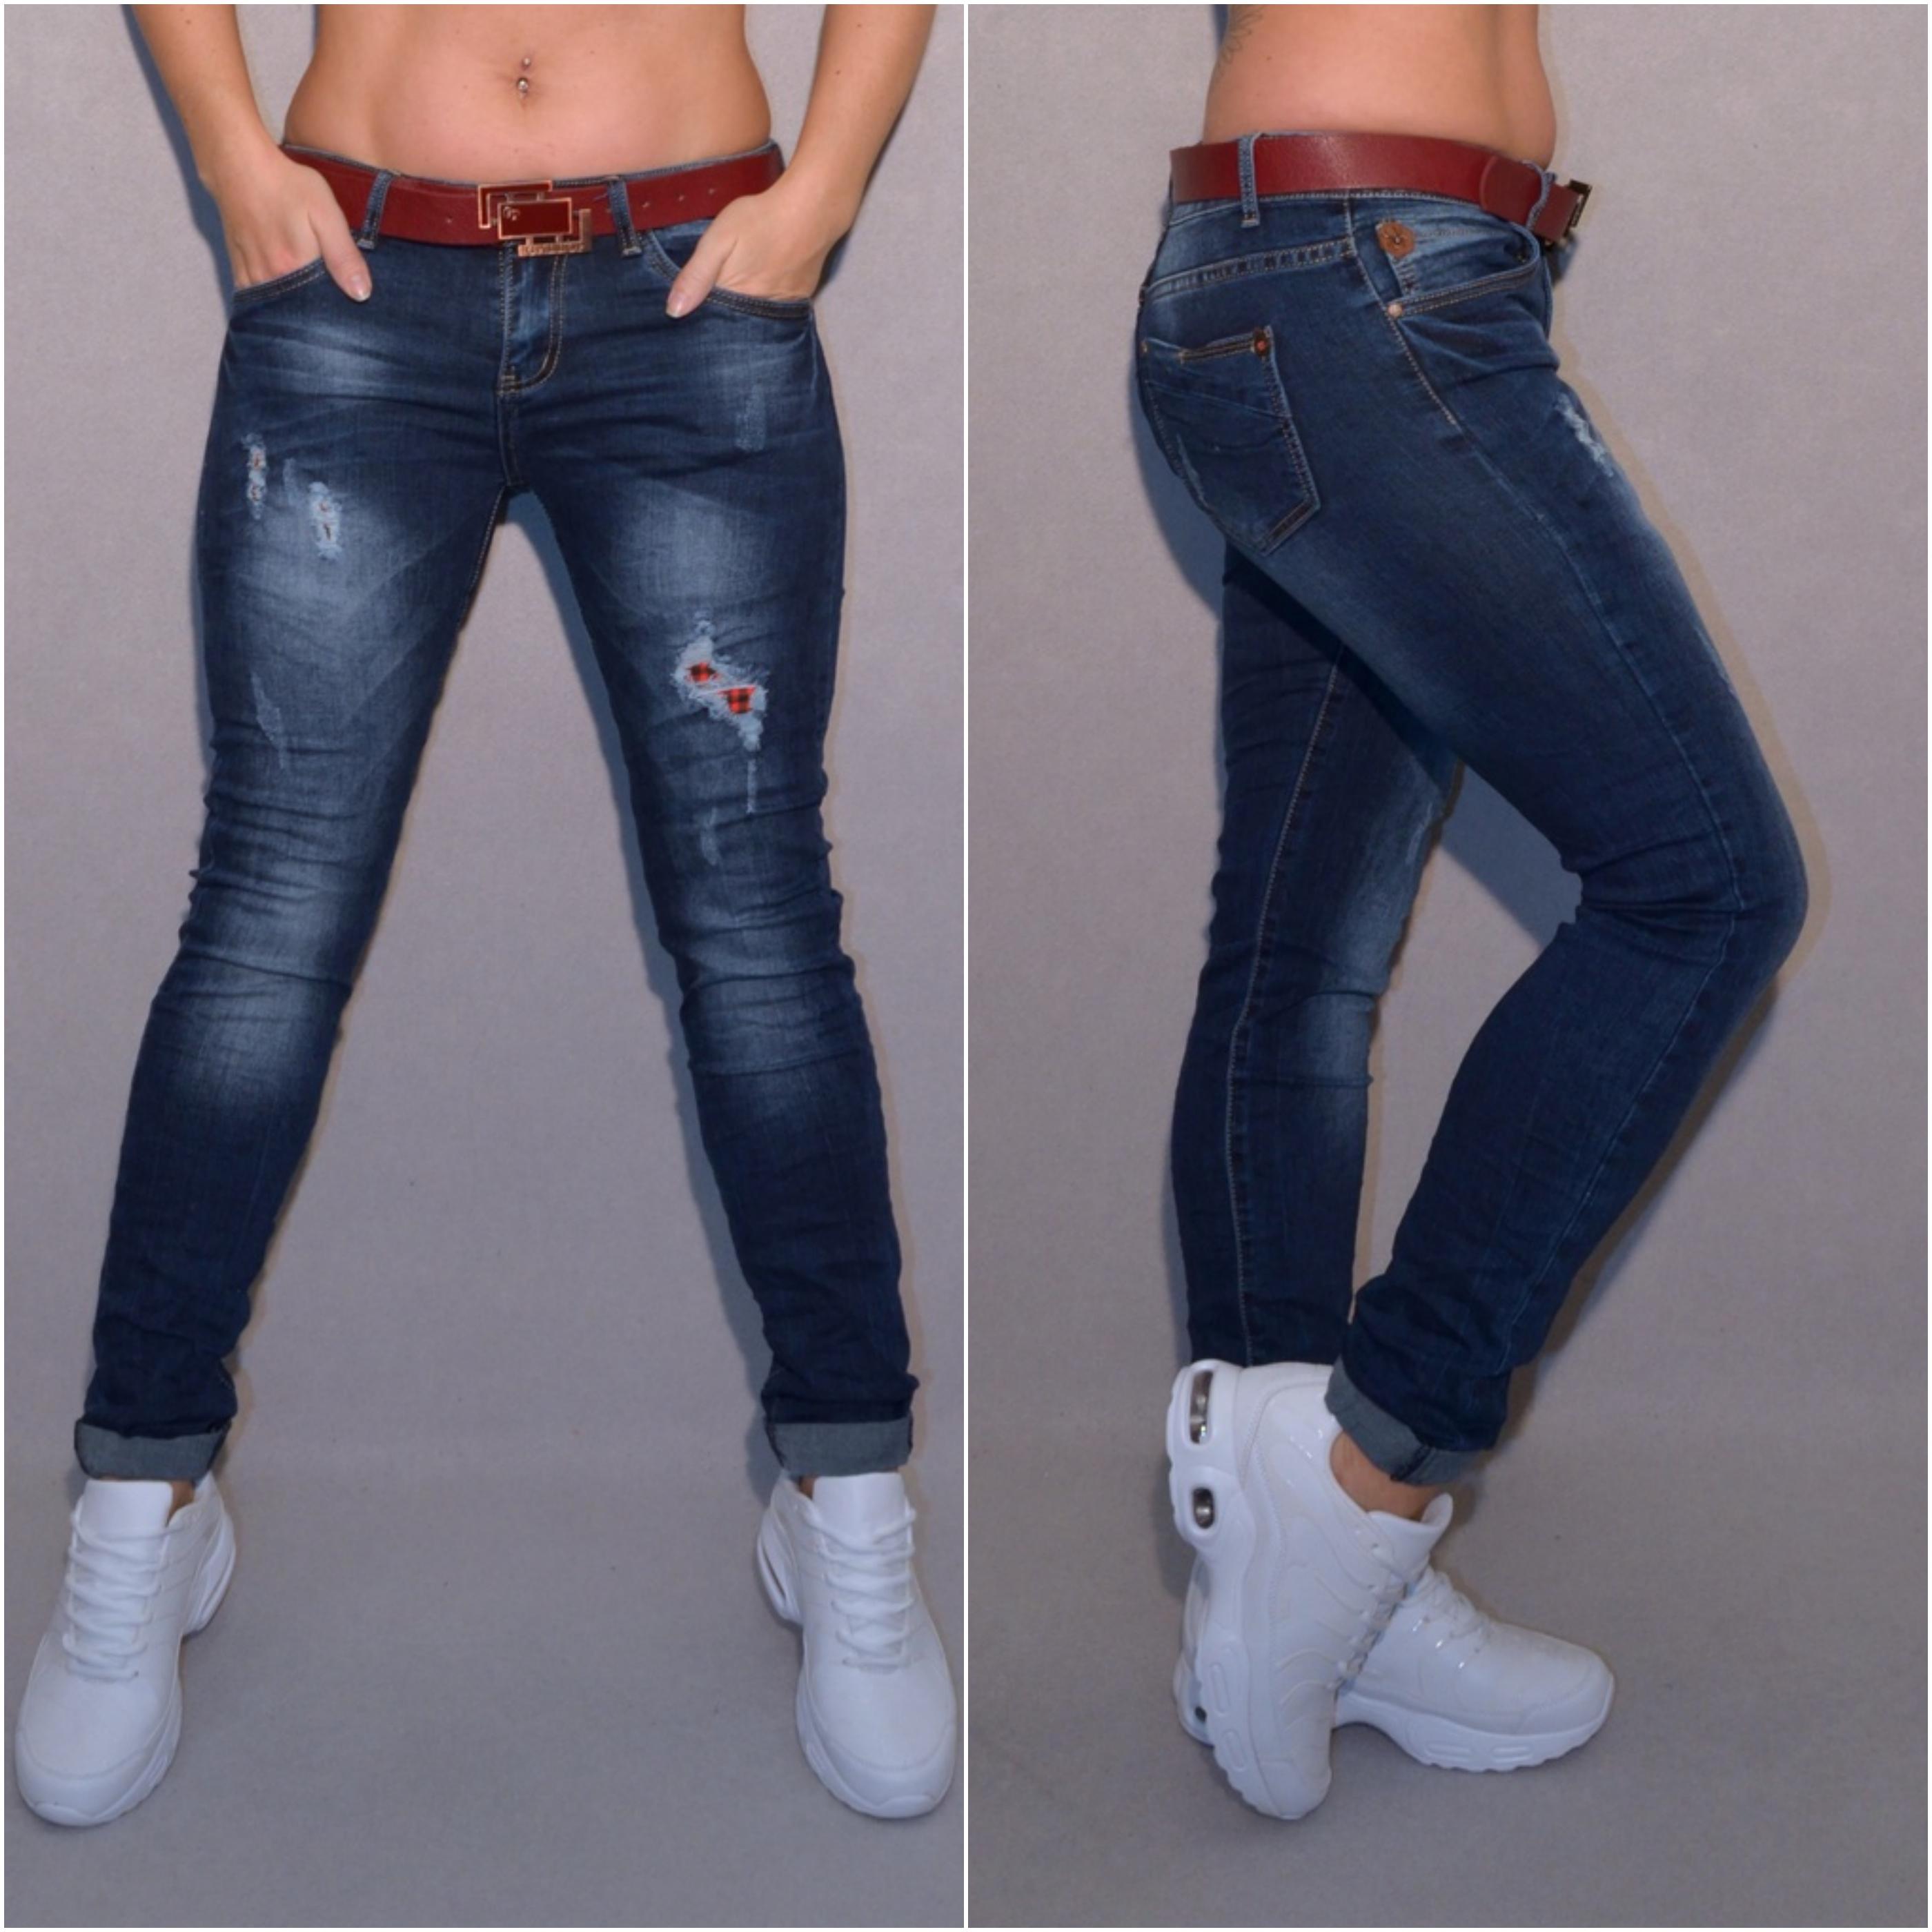 Bequeme stretch JEANS mit braunem Gürtel DUNKELBLAU   Jeans   Damenmode    Mode   Coral Fashion 4455a24edb